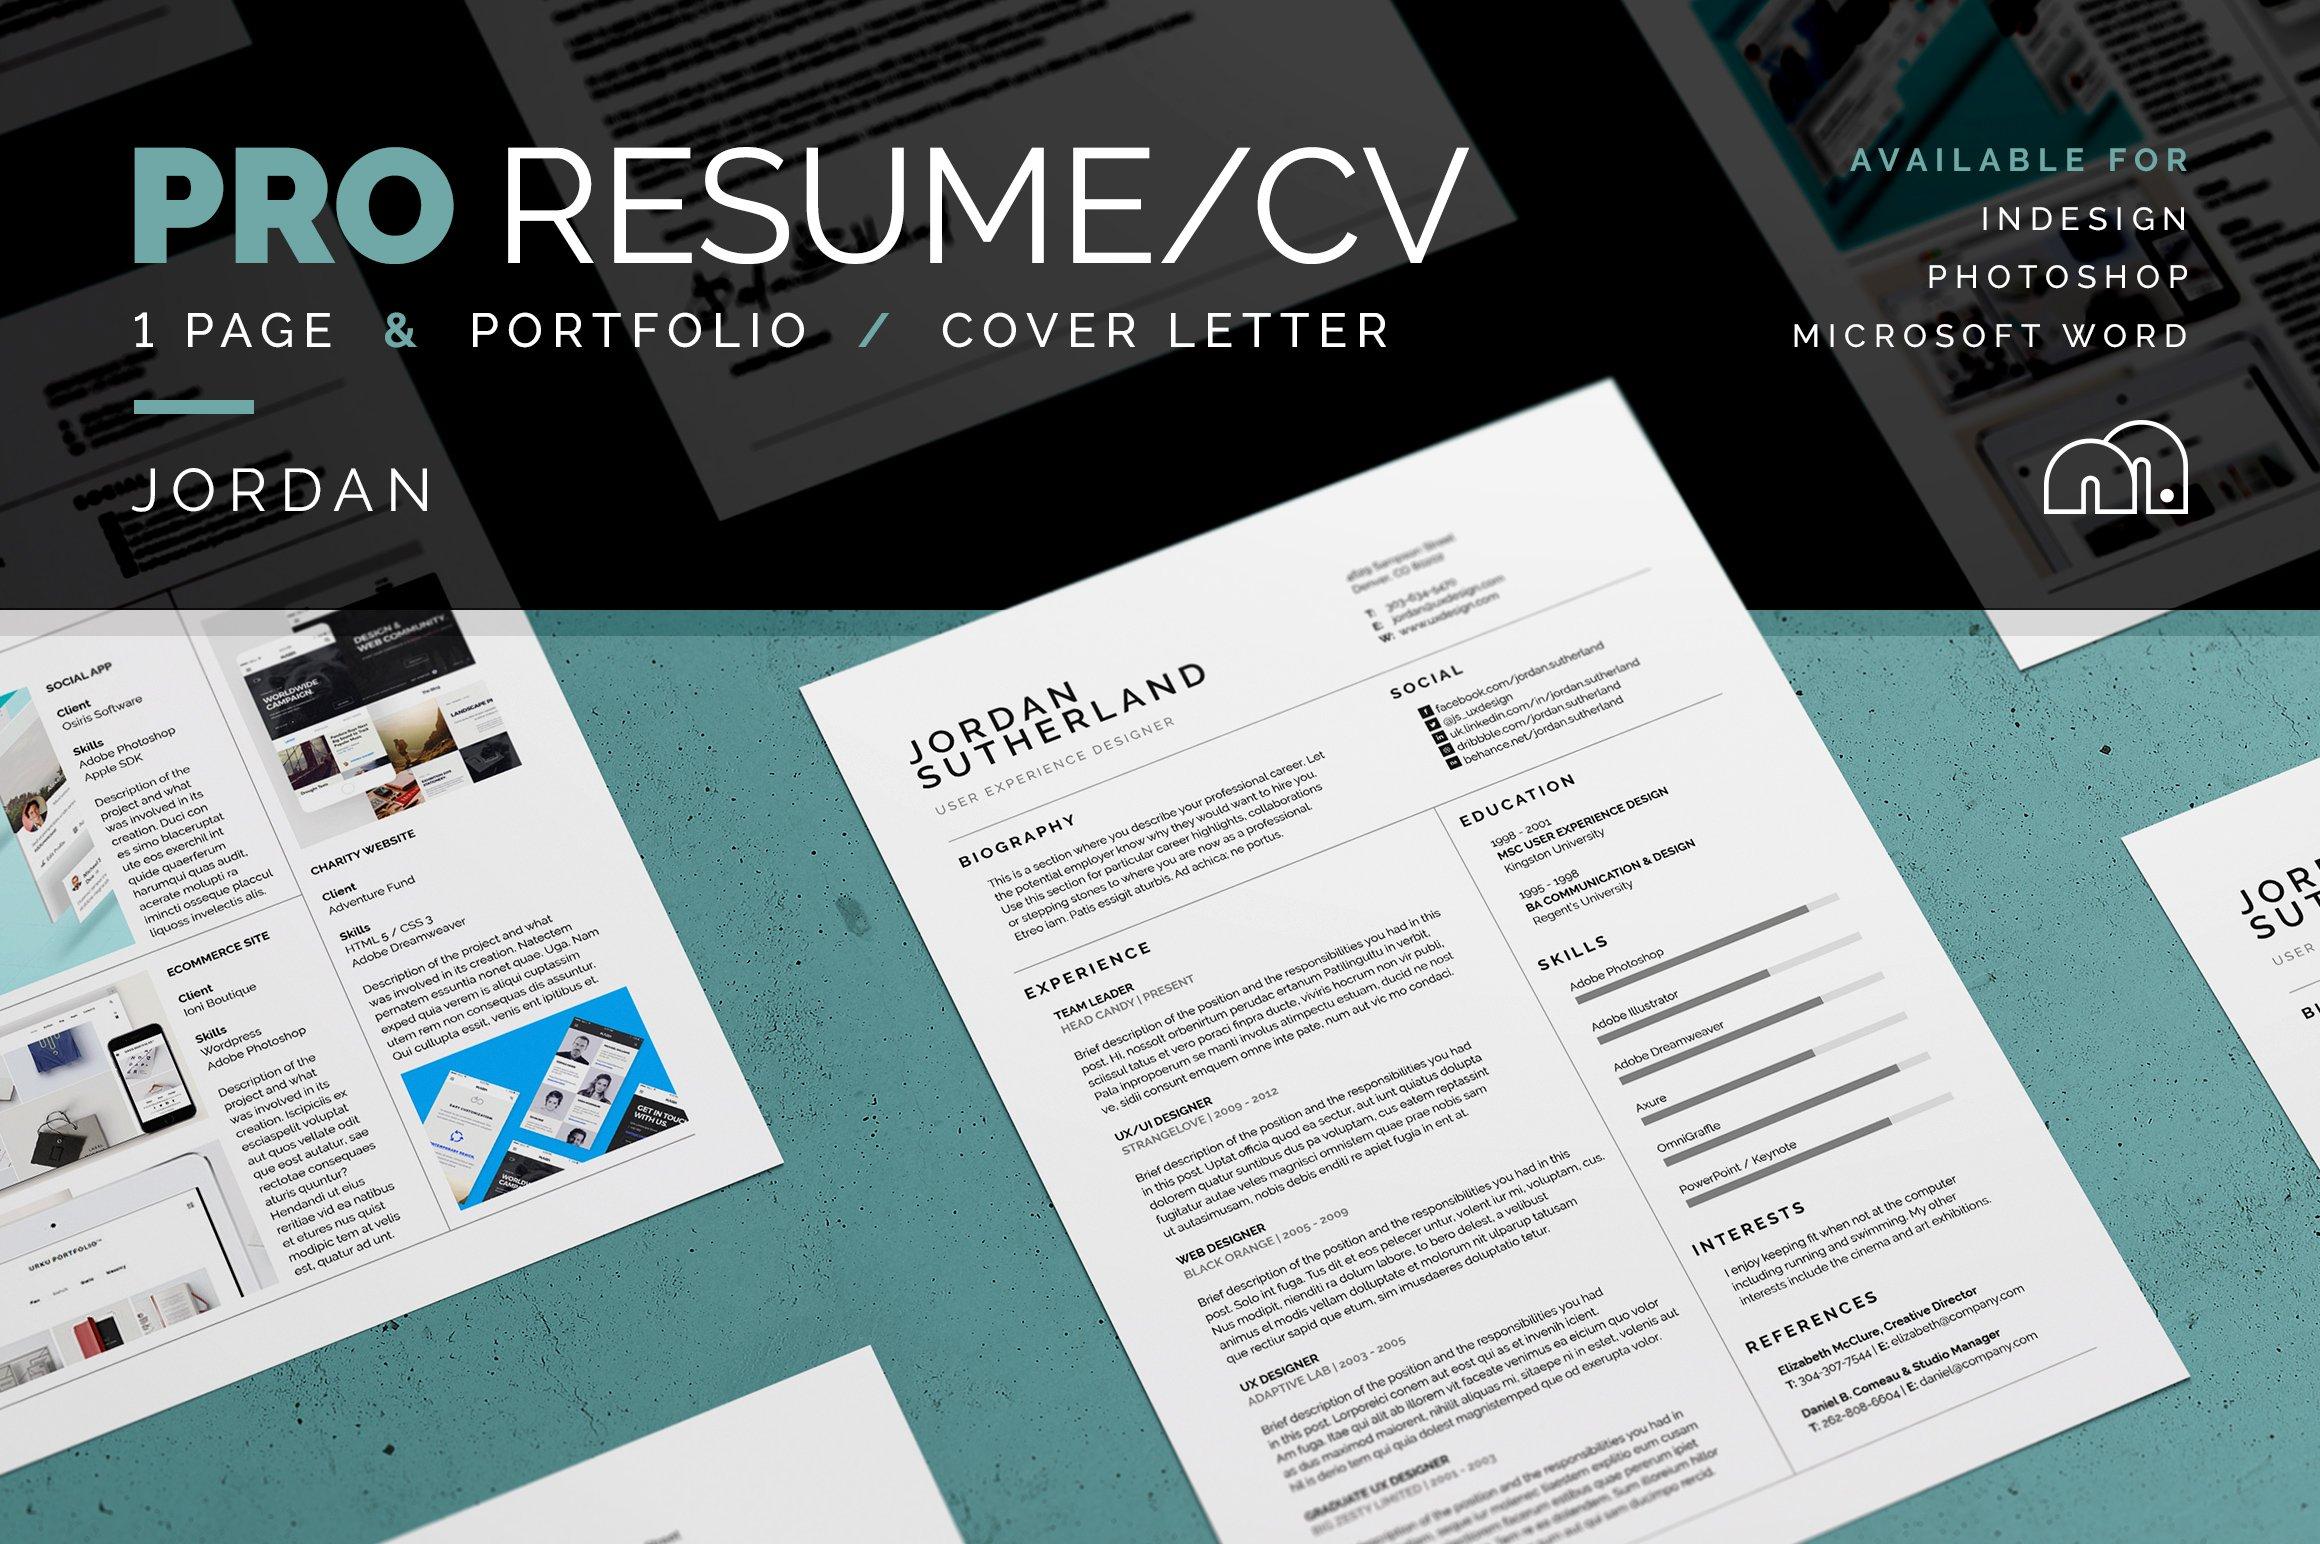 pro resume cv cameron resume templates creative market